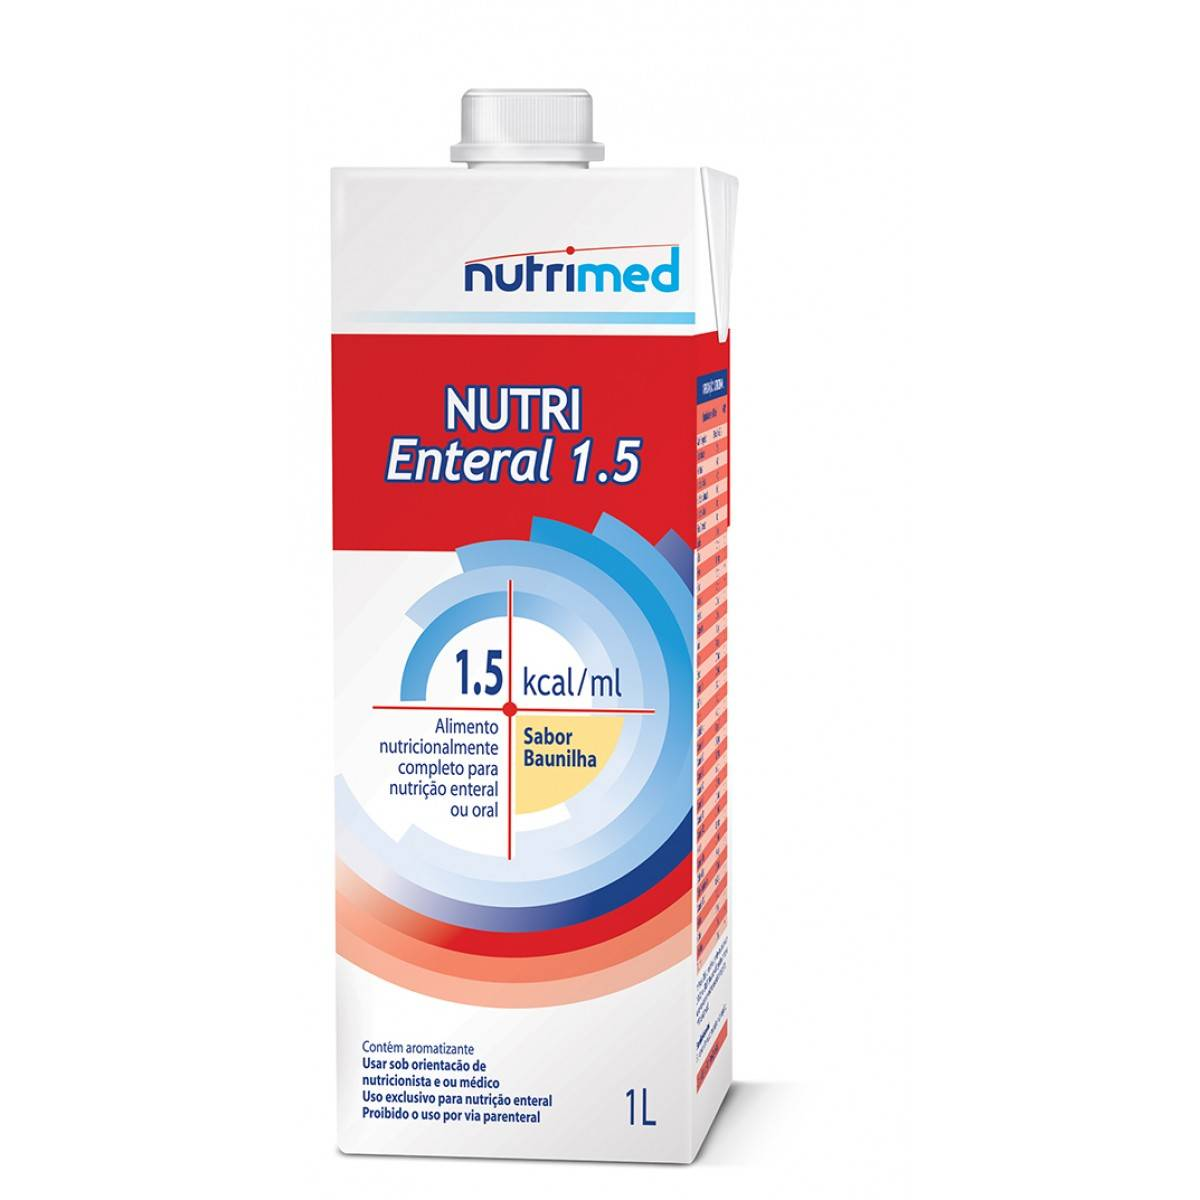 Nutri Enteral  (1.5 Kcal/ml) 1L tetra pak - (Danone)